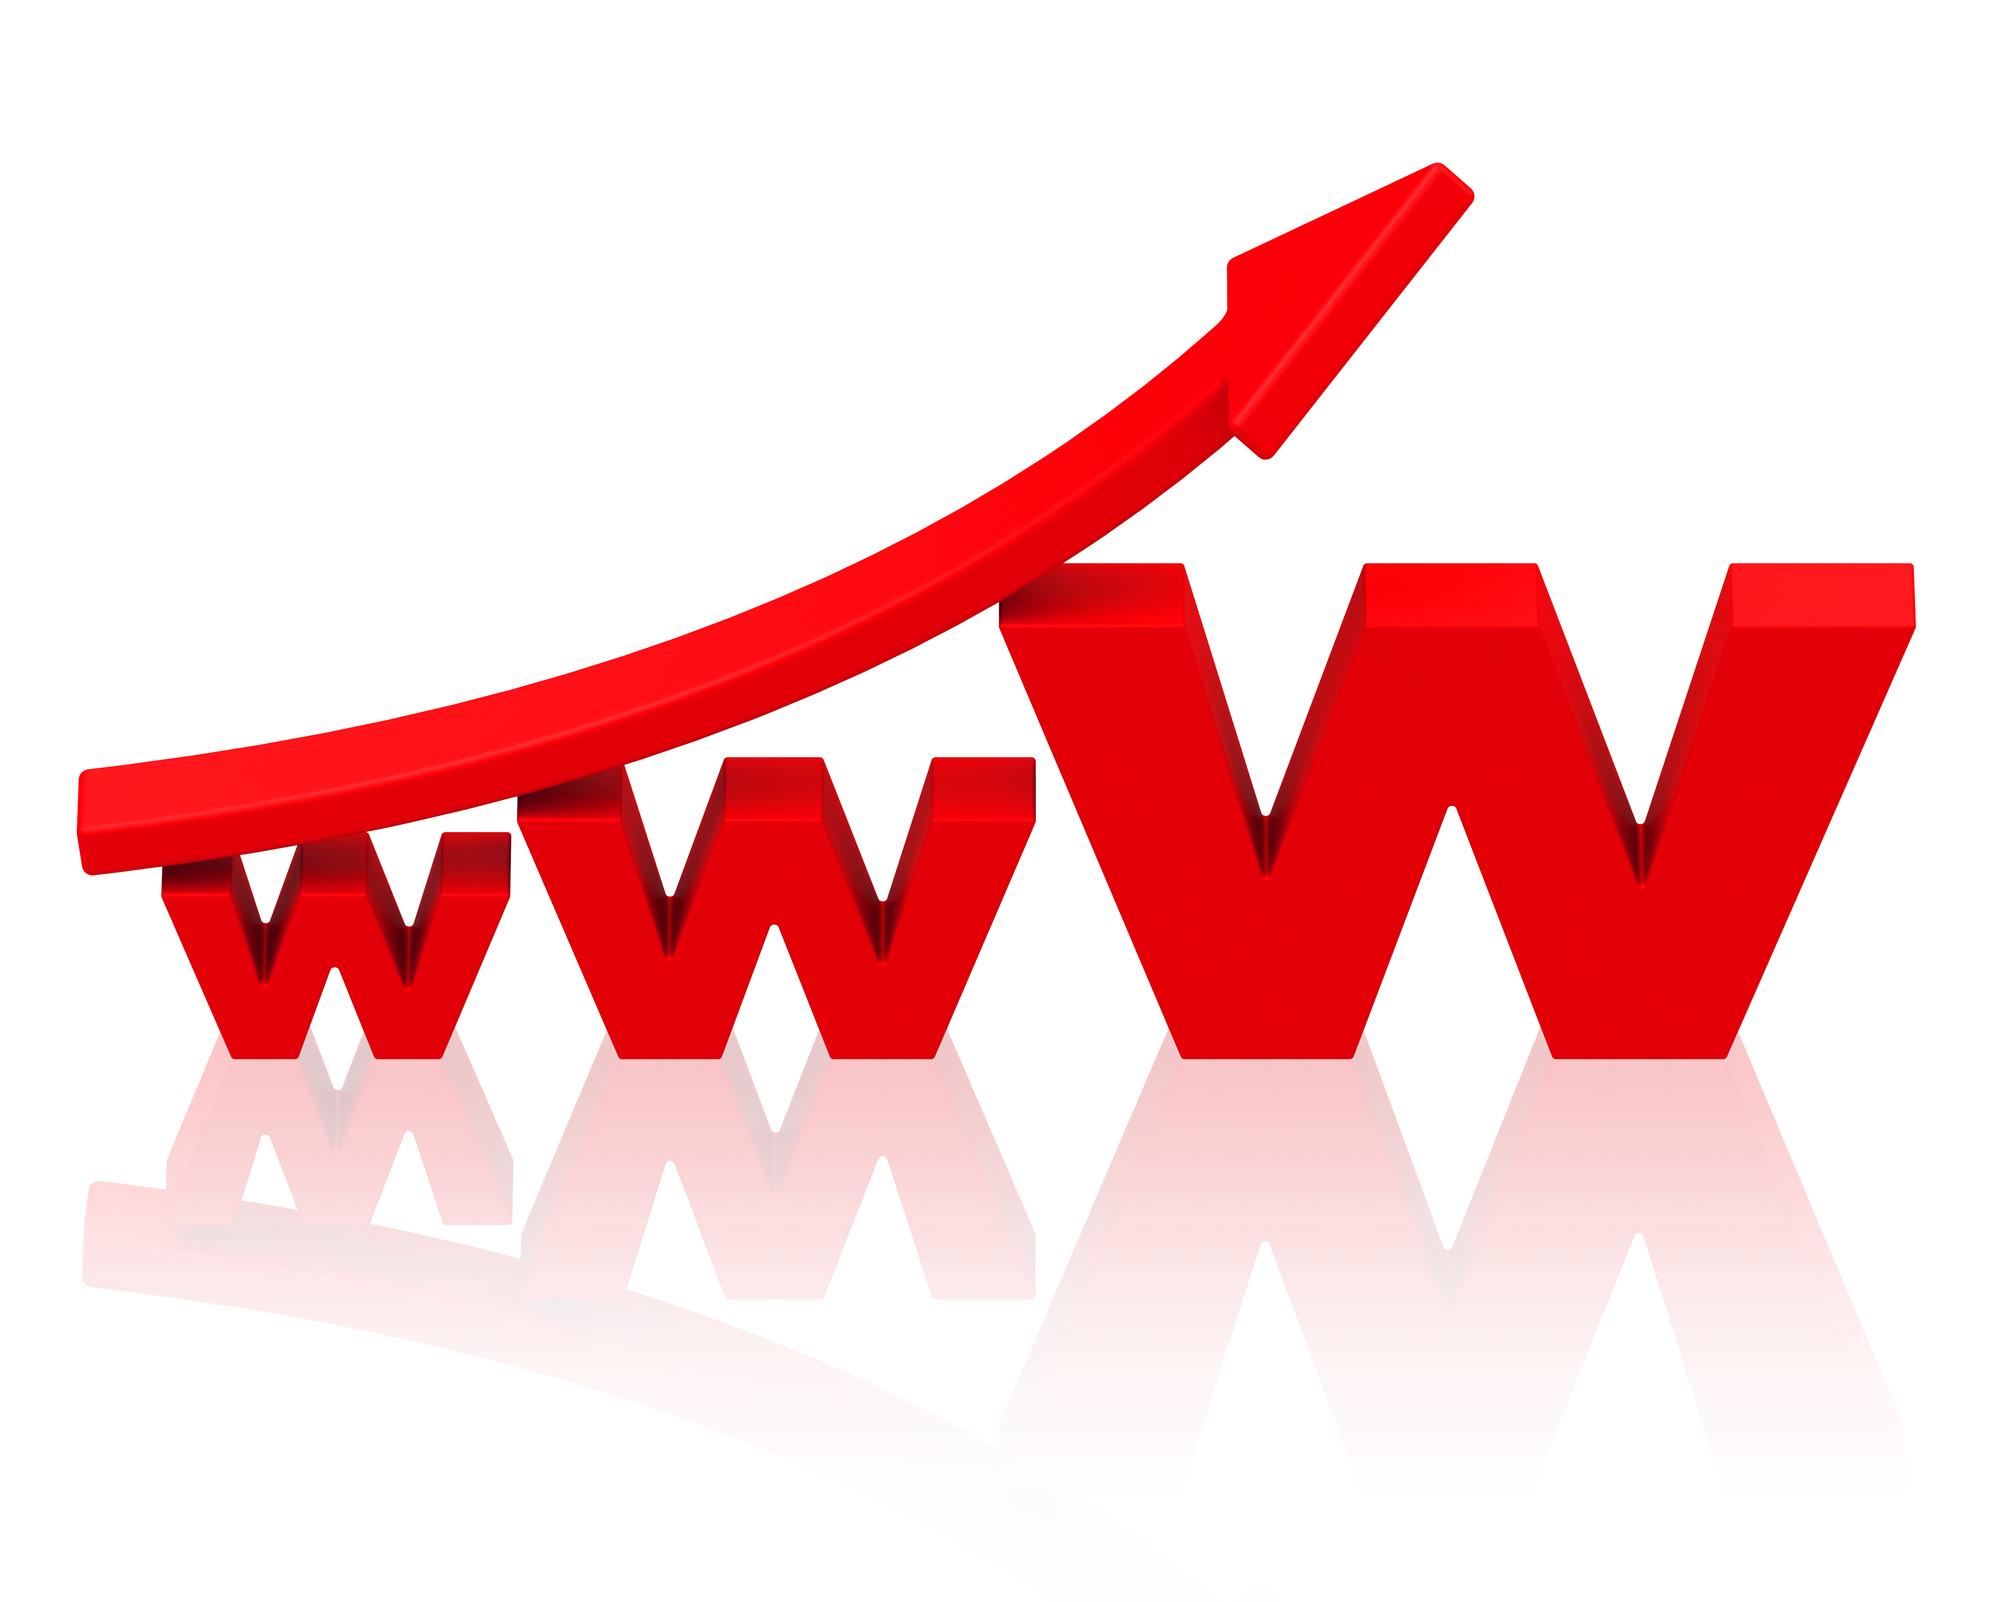 Webサイトへのアクセス数アップ!SEO対策はなぜ必要なのか?